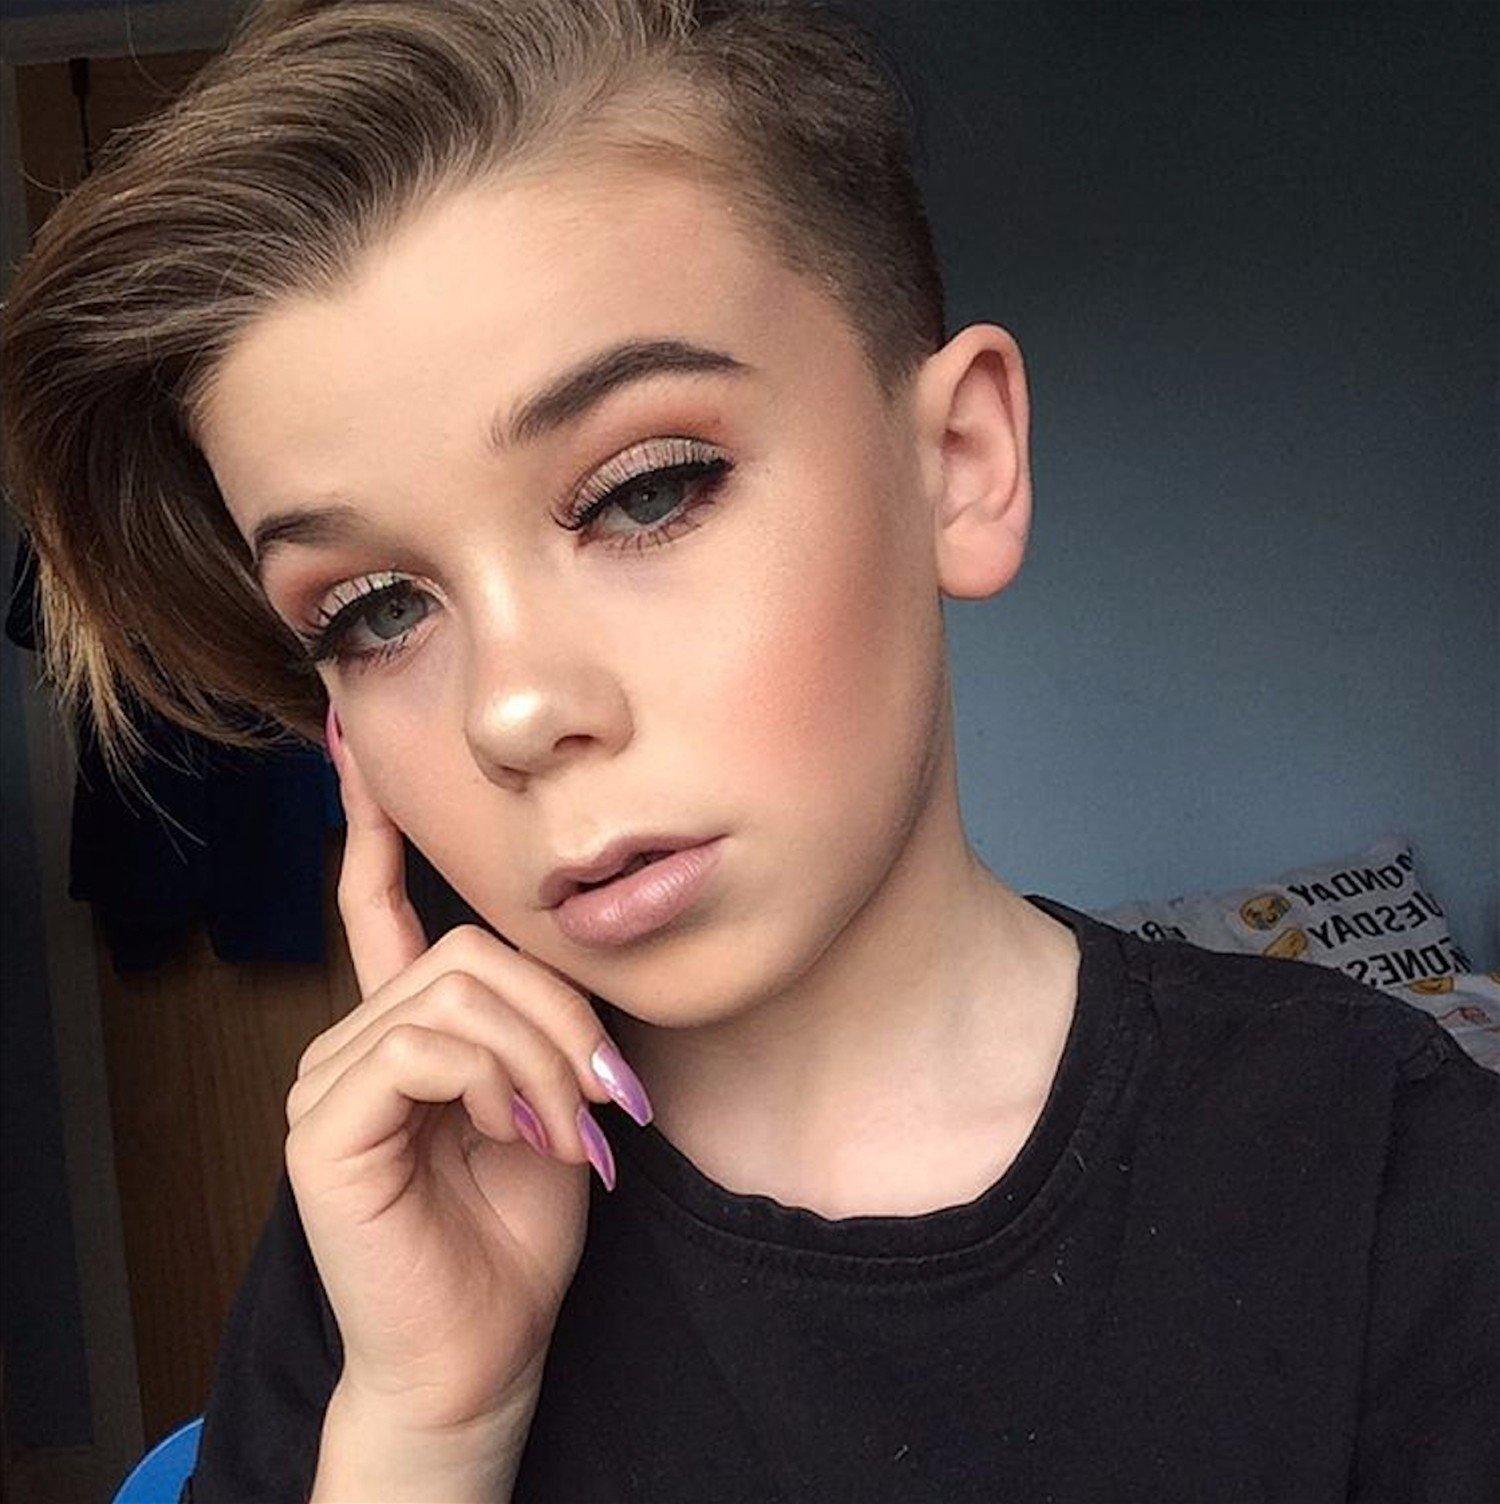 Makeup by Jack Beauty Tutorials | POPSUGAR Beauty